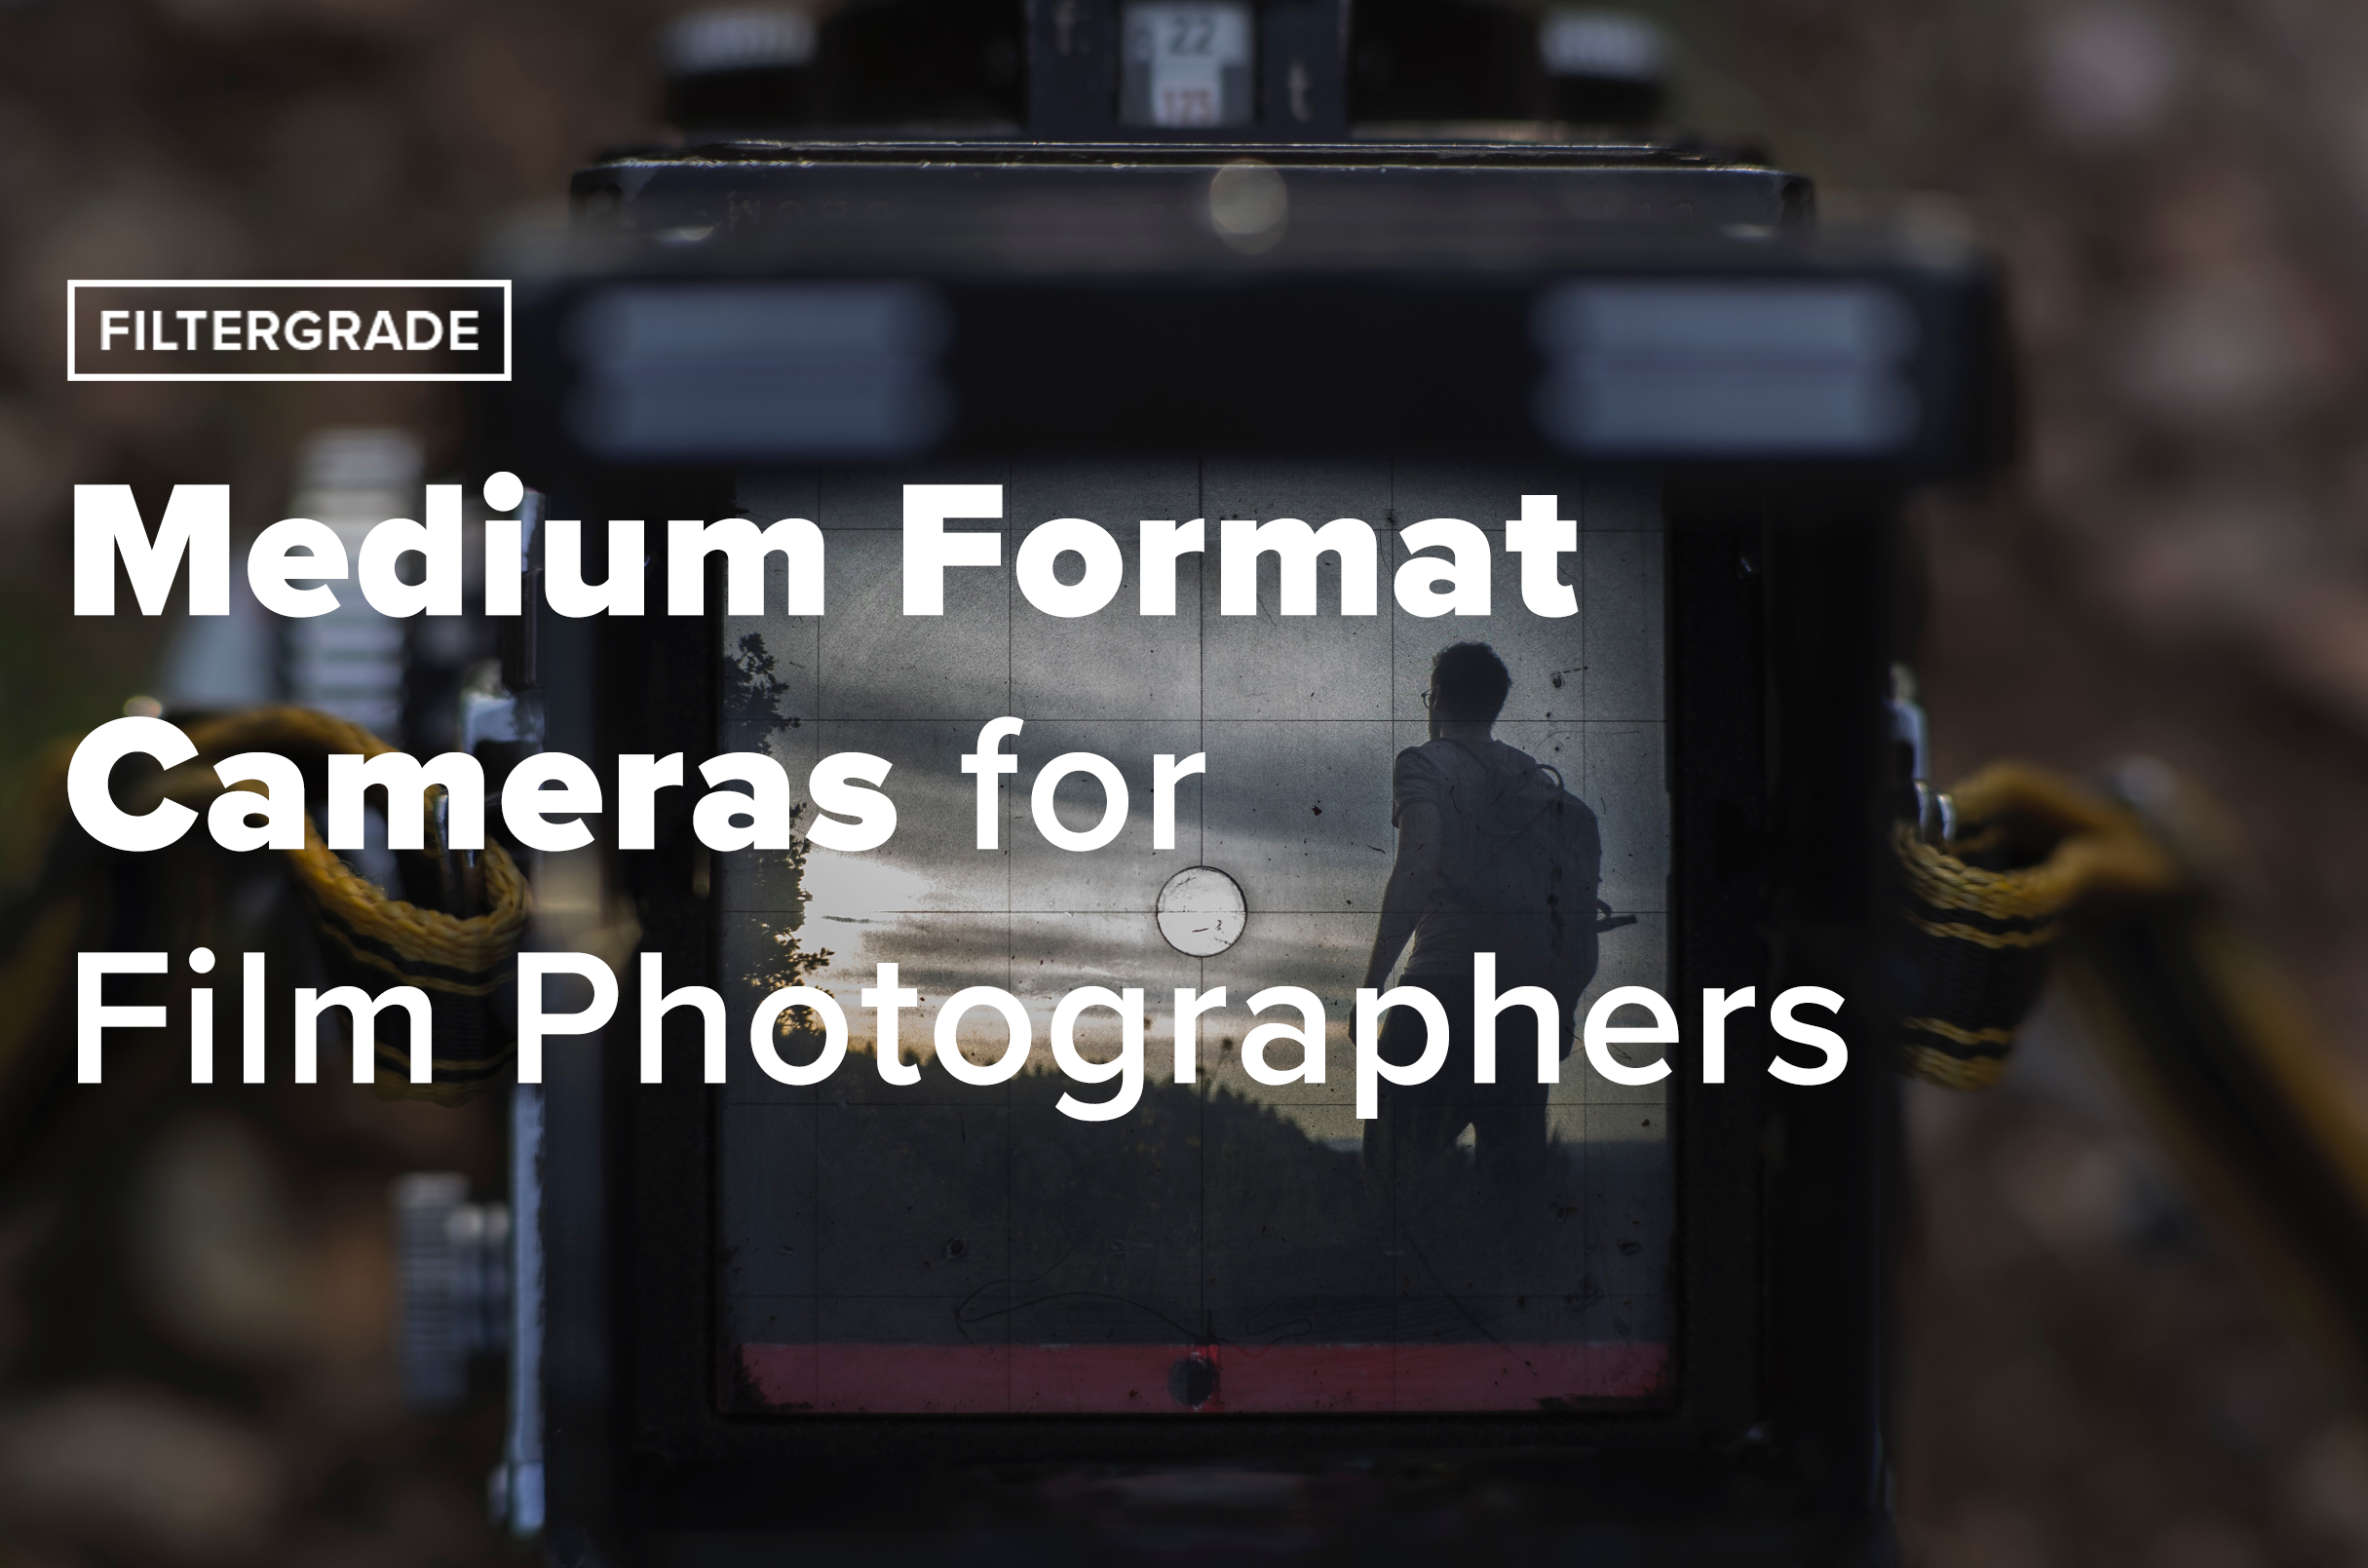 Medium Format Cameras for Film Photographers - FilterGrade